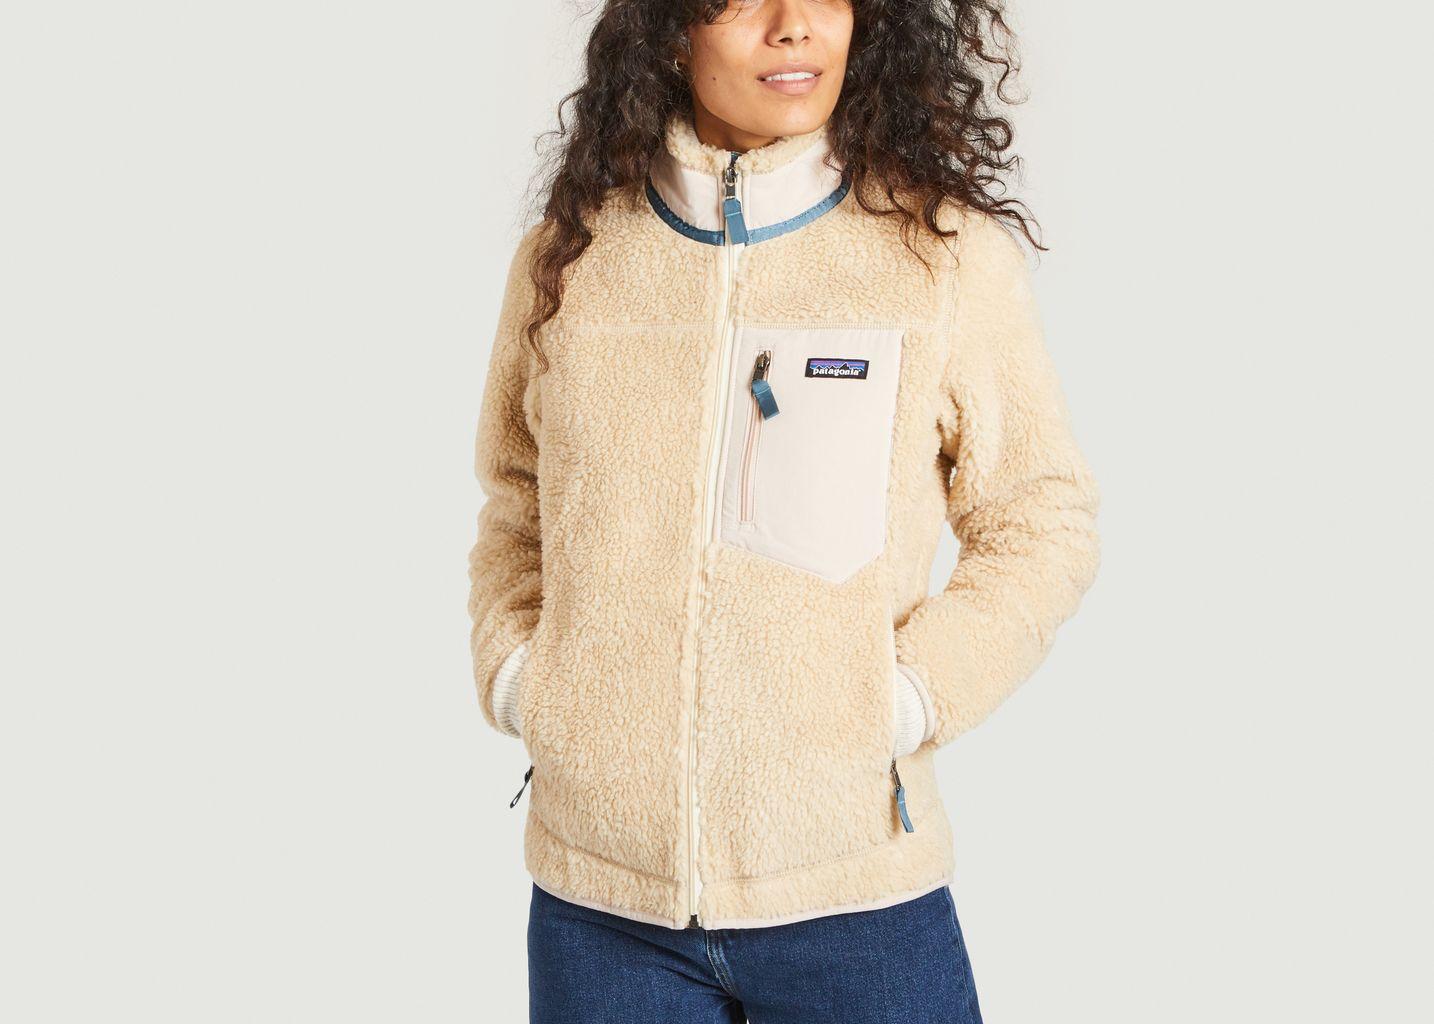 Veste polaire col montant Retro X - Patagonia